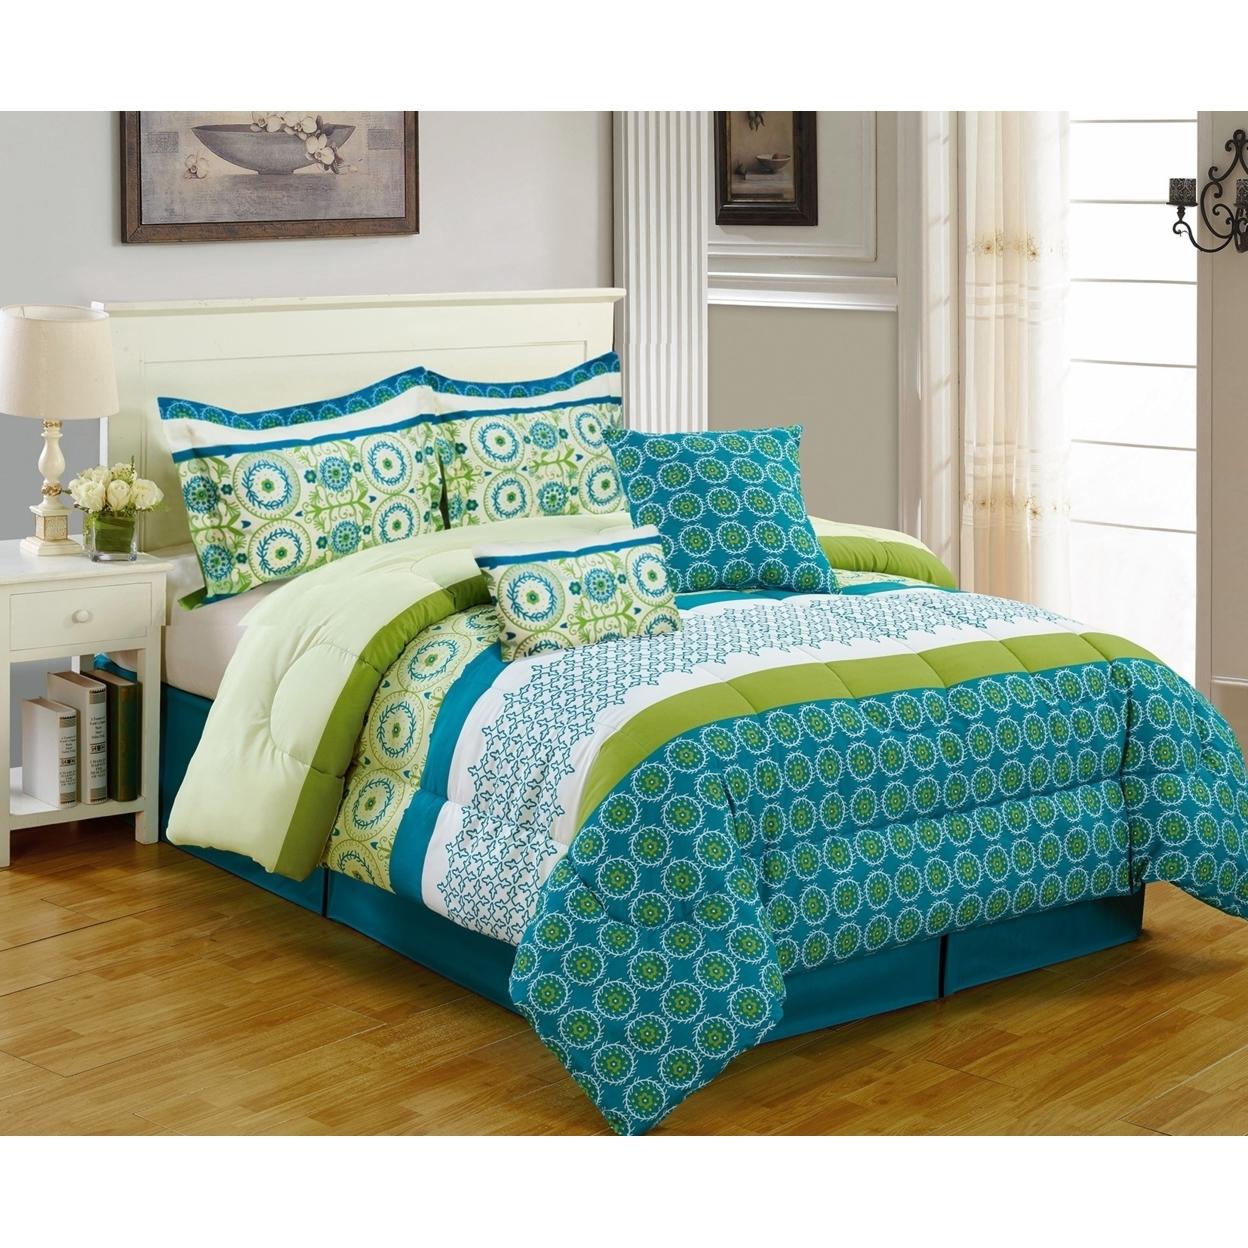 Bibb Home 5 PC Piece Premium Microfiber Comforter Set 3 Designs – Queen and King – Queen, Aqua Green Floral